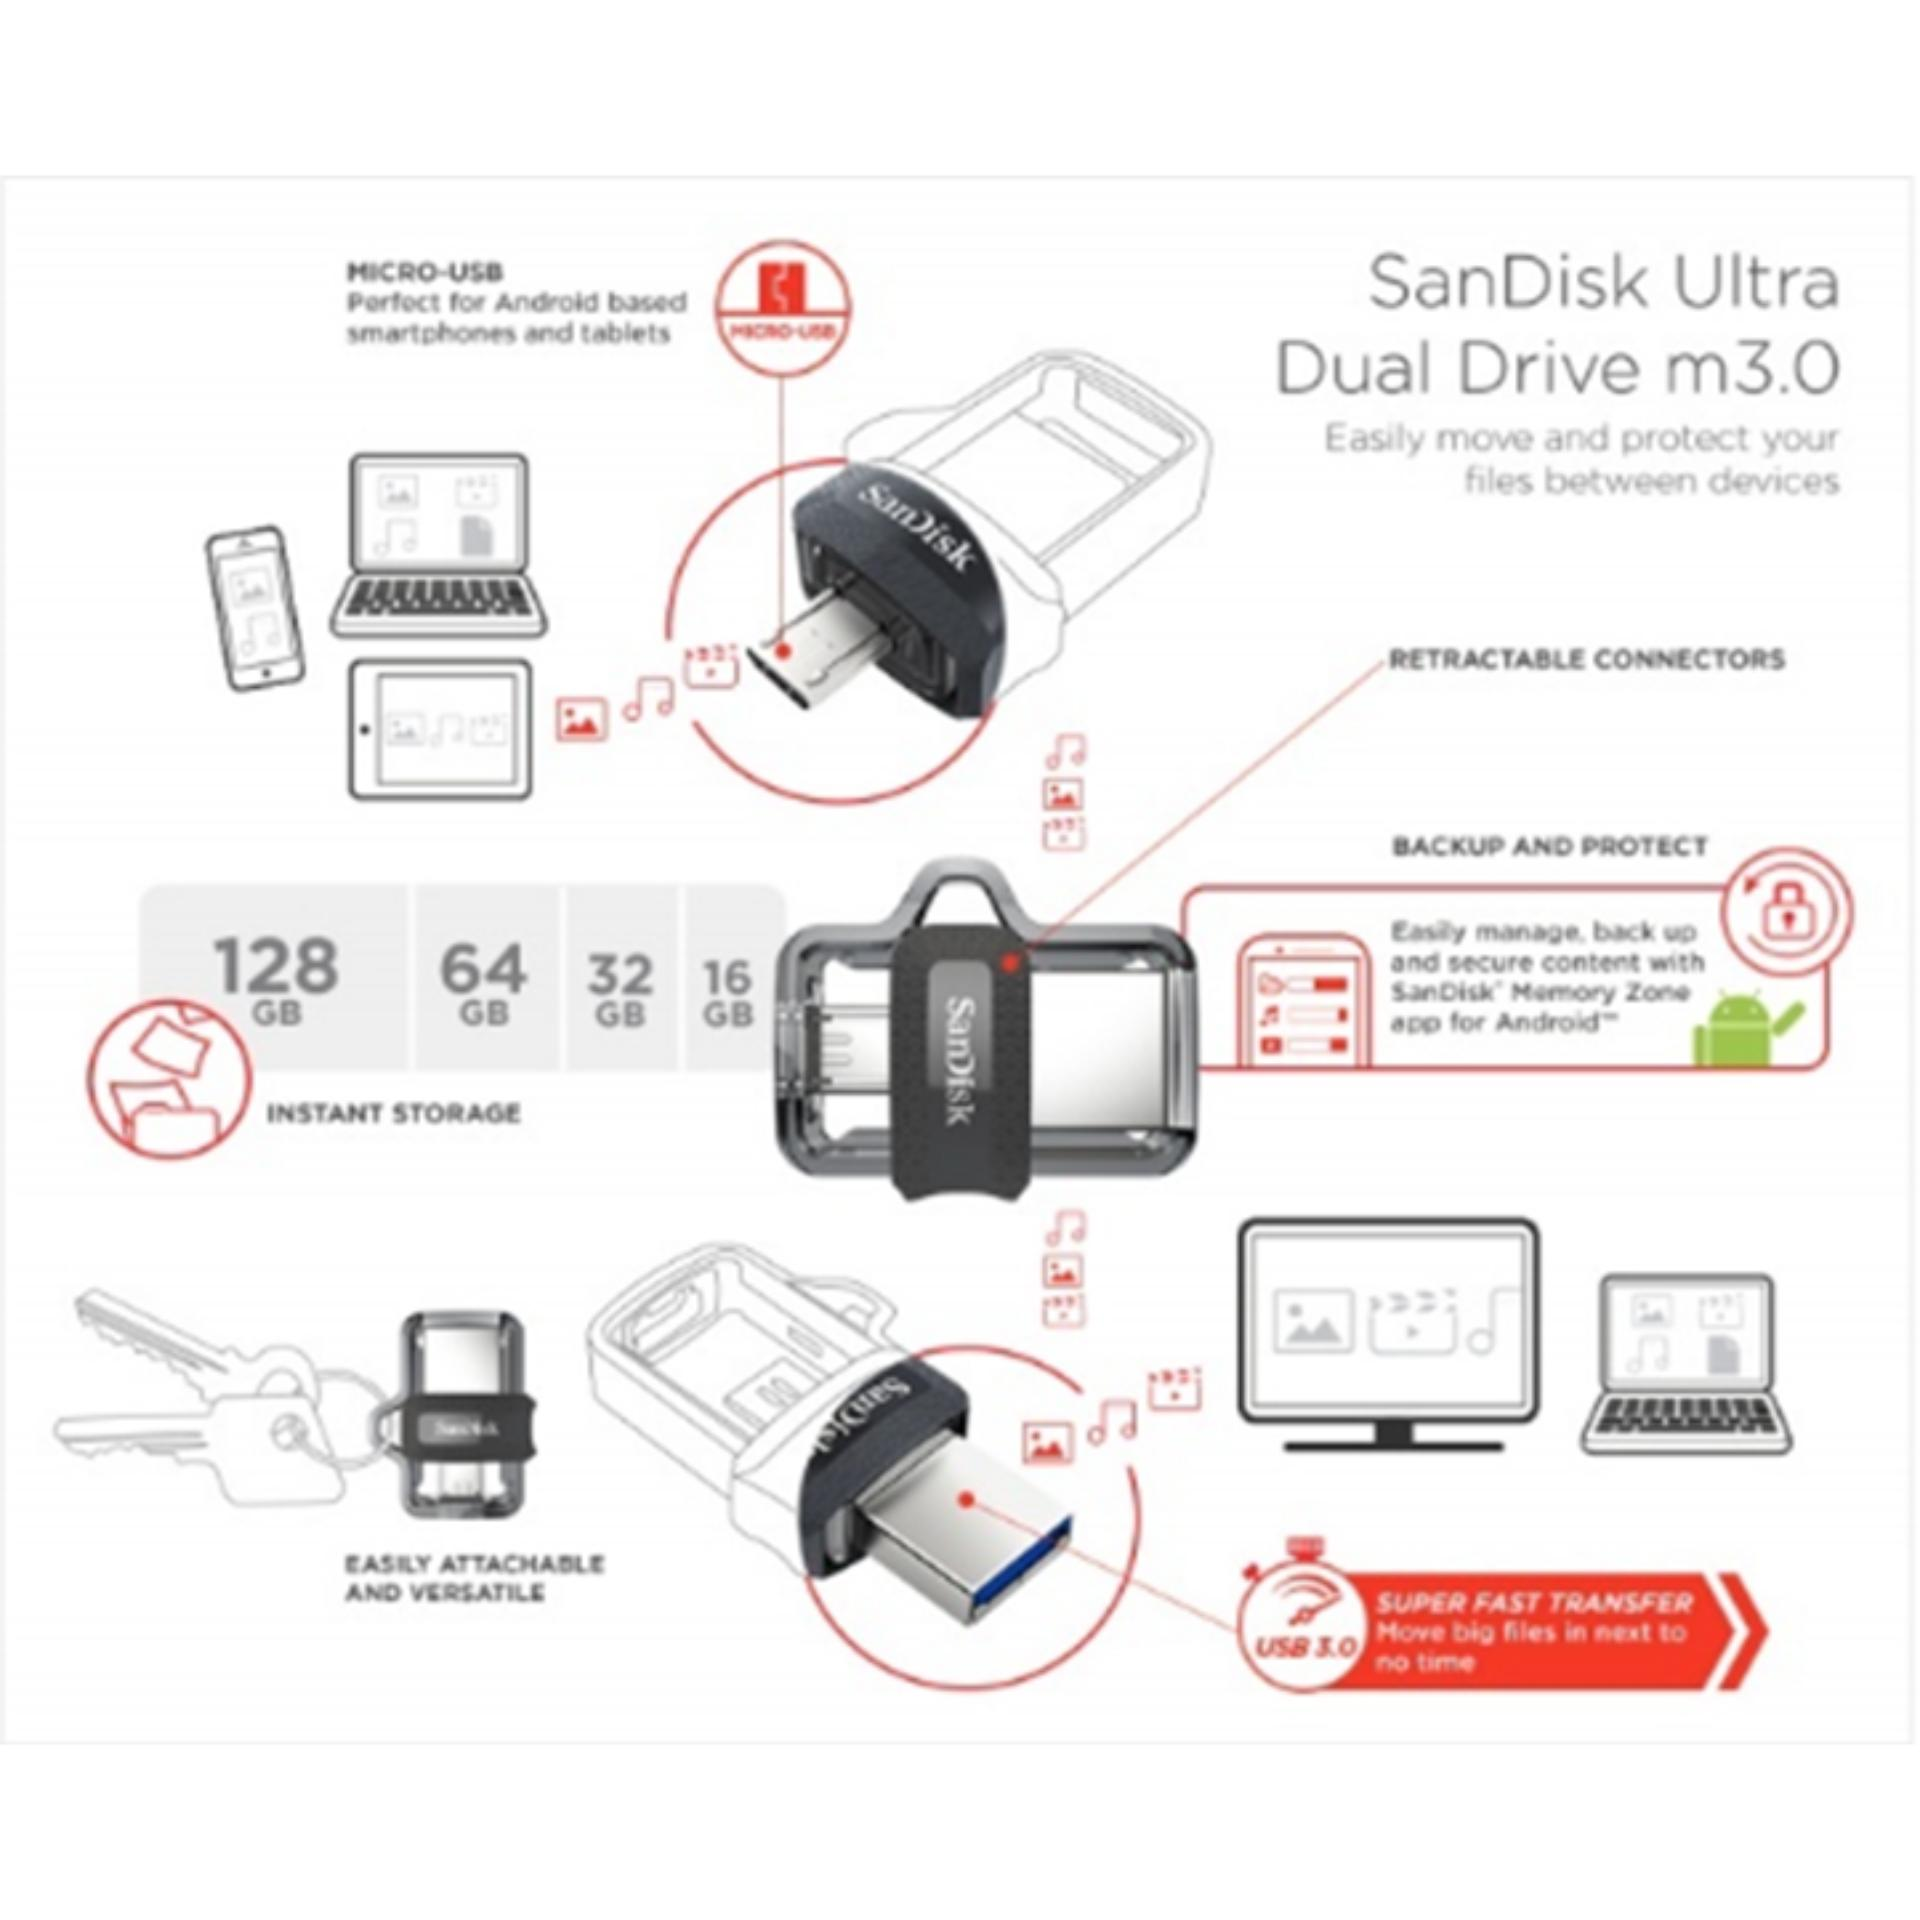 Philippines Sandisk Sddd3 32gb Otg Dual Drive White Gold Edition Usb Set Of 5